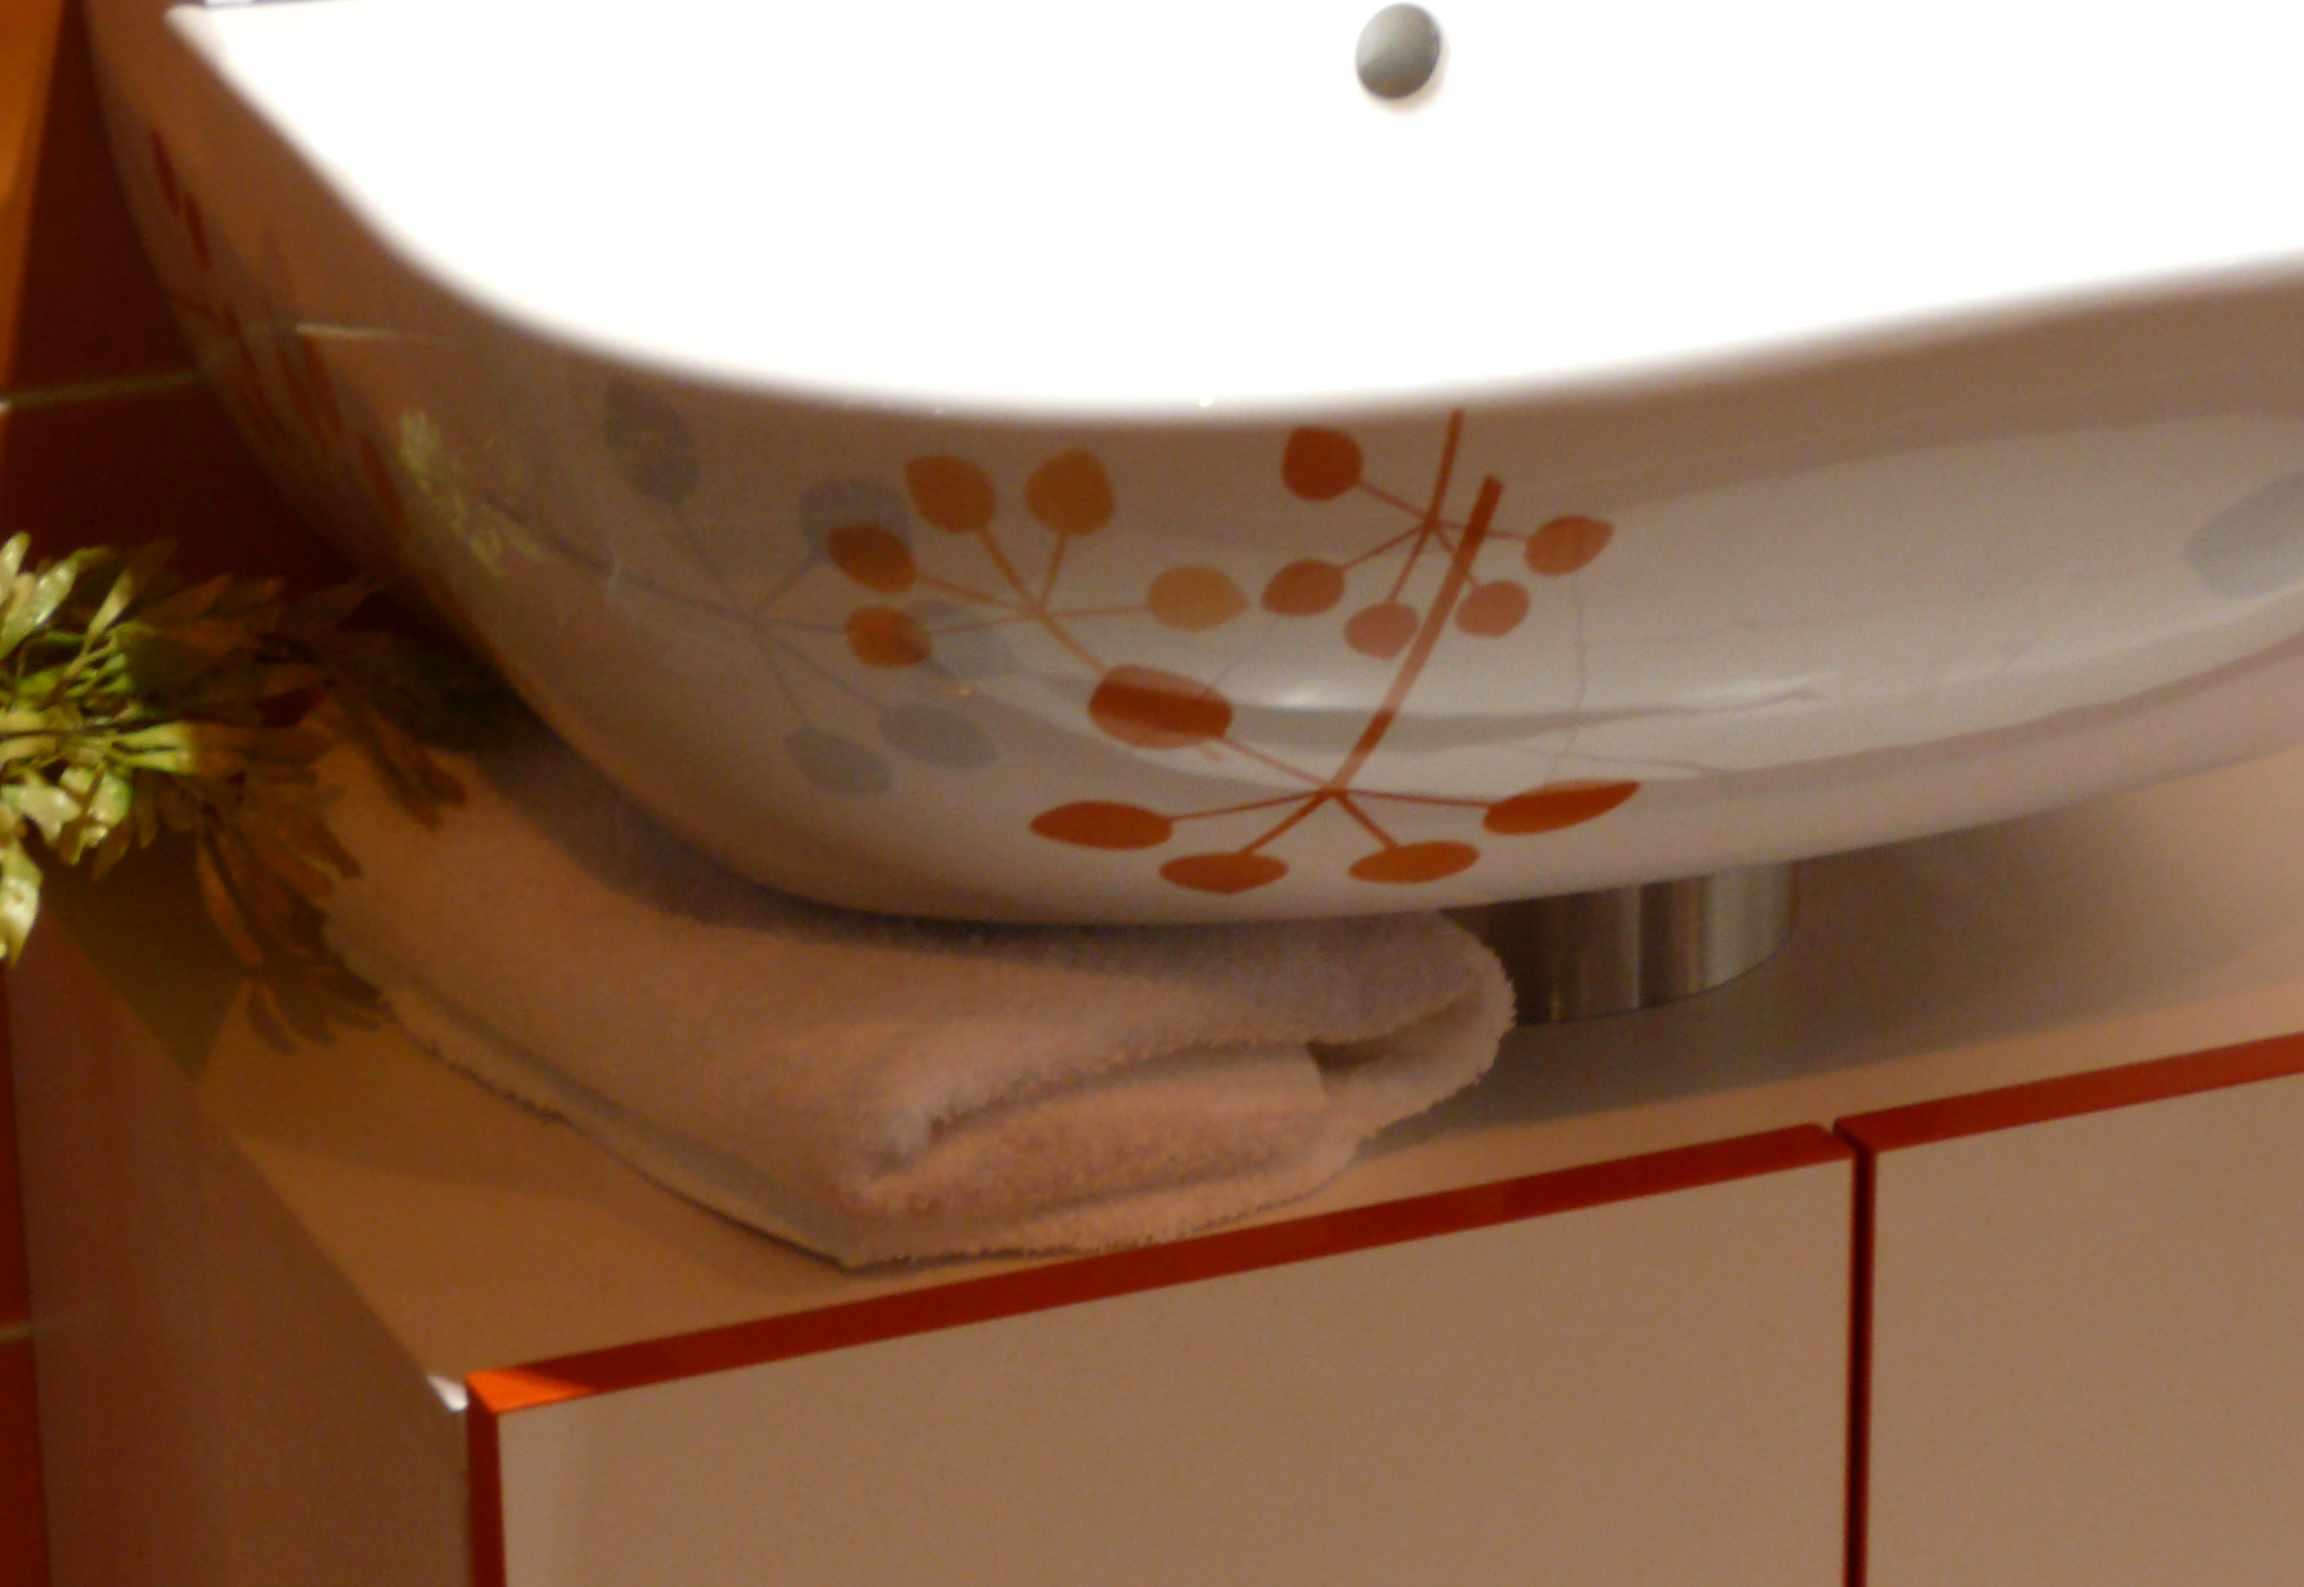 Salle De Bain Colorée Castorama : Meuble et vasque « Pretty Silhouette », Collection O novo Style chez …